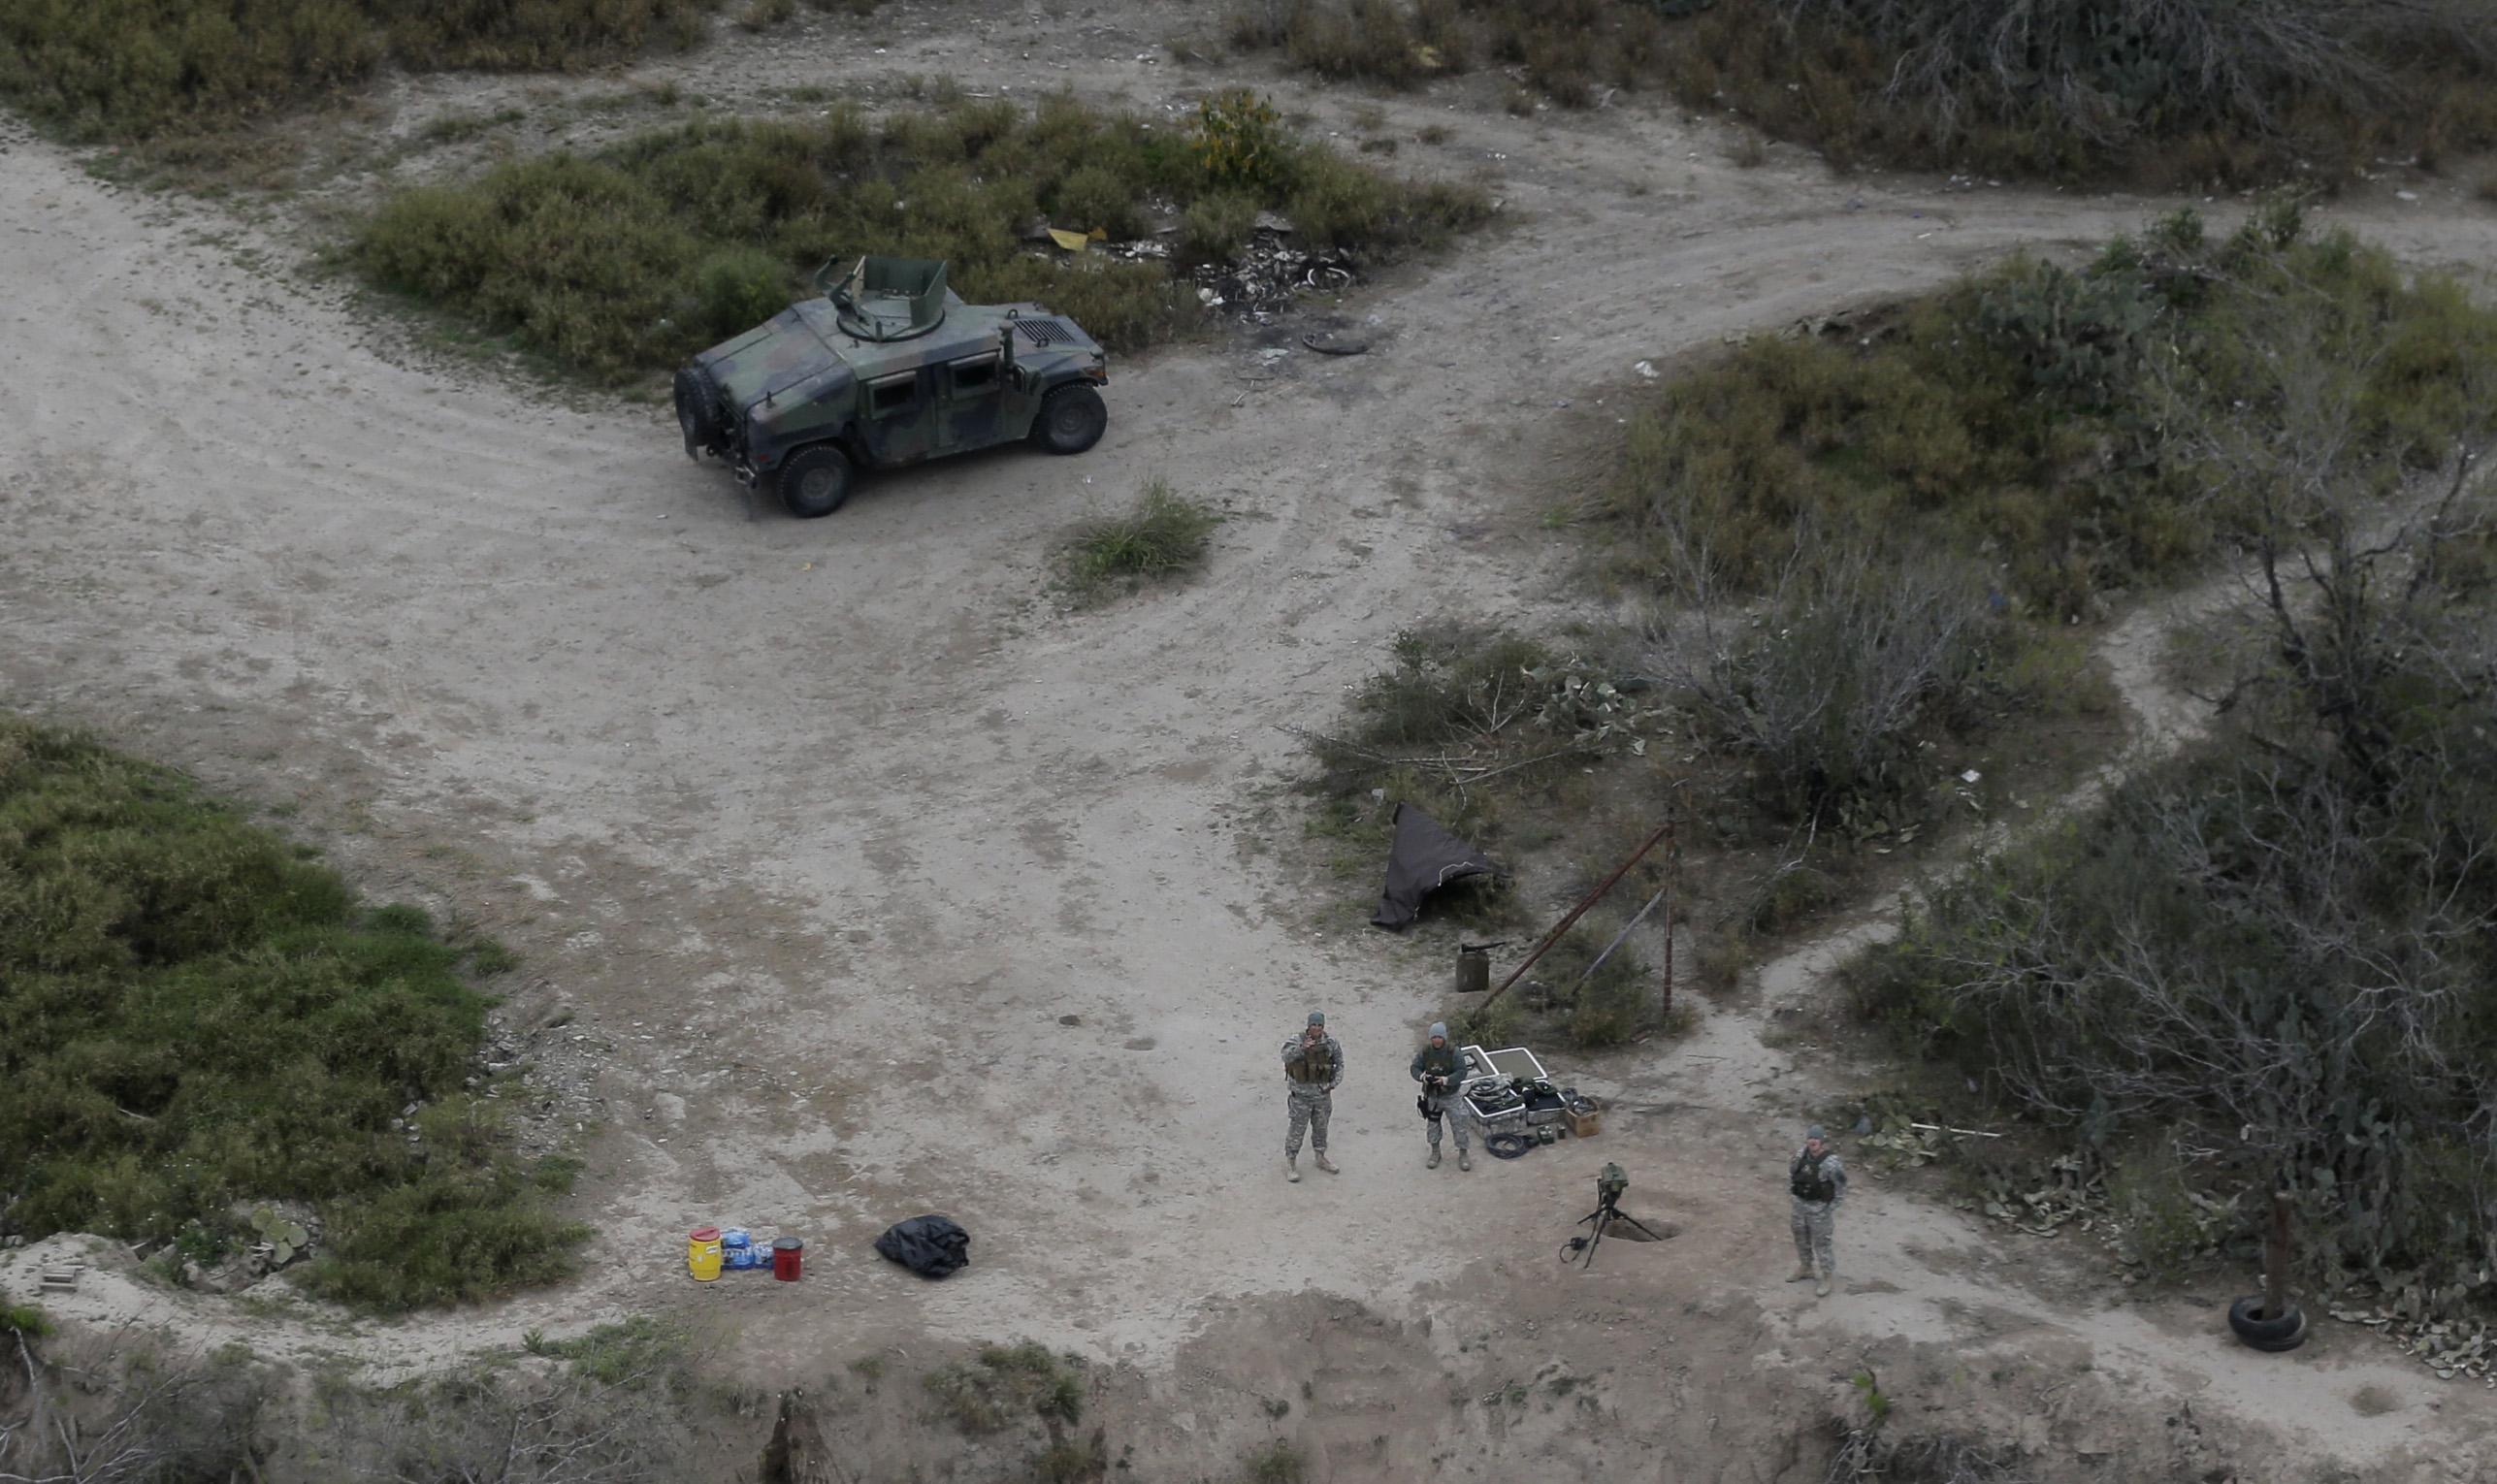 <p>Members of the National Guard patrol along the Rio Grande at the Texas-Mexico border, Tuesday, Feb. 24, 2015, in Rio Grande City, Texas.</p>